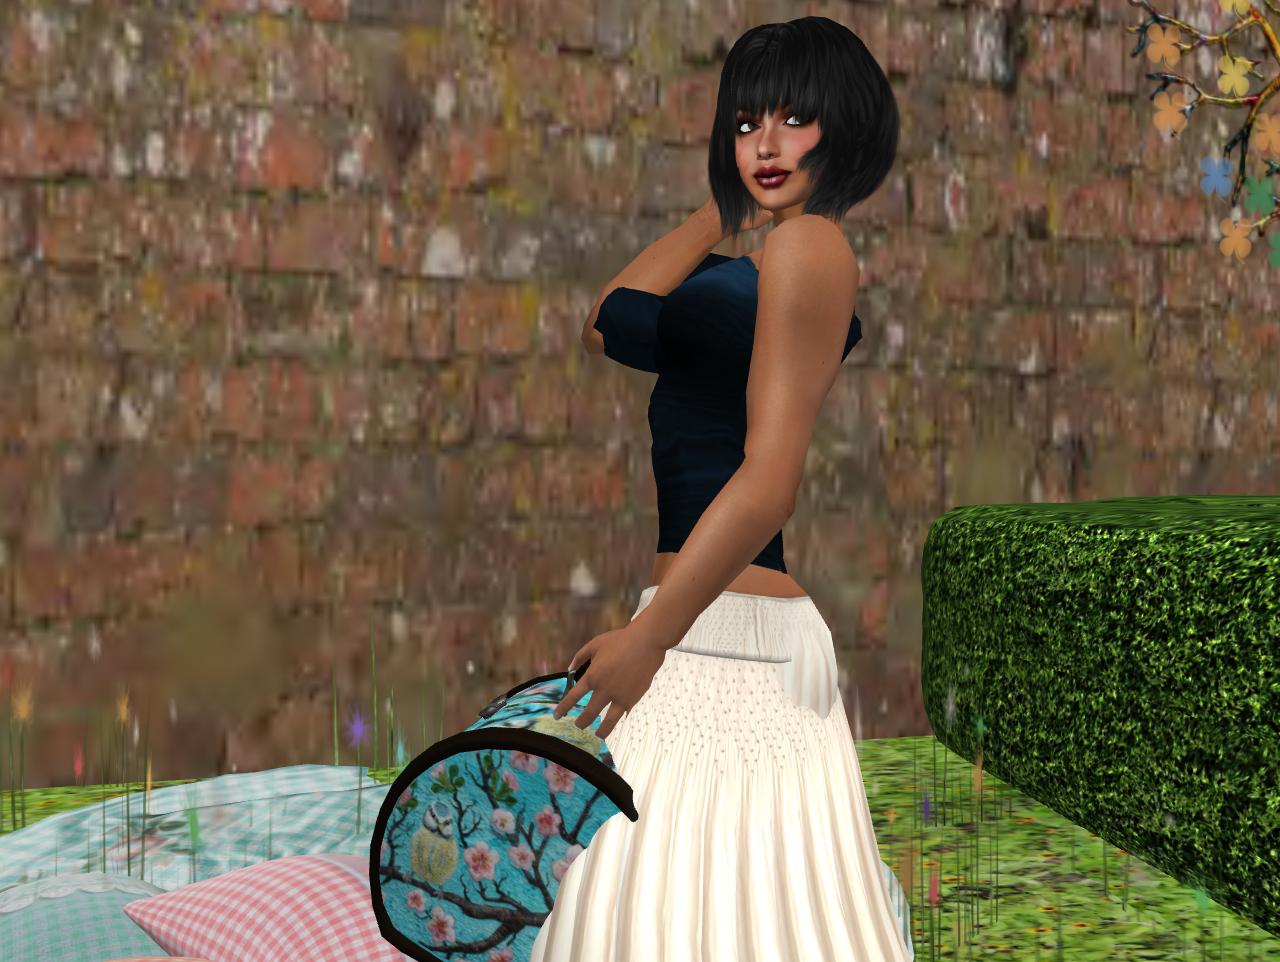 imagetwist.com lsm-03 The SL Fashionista